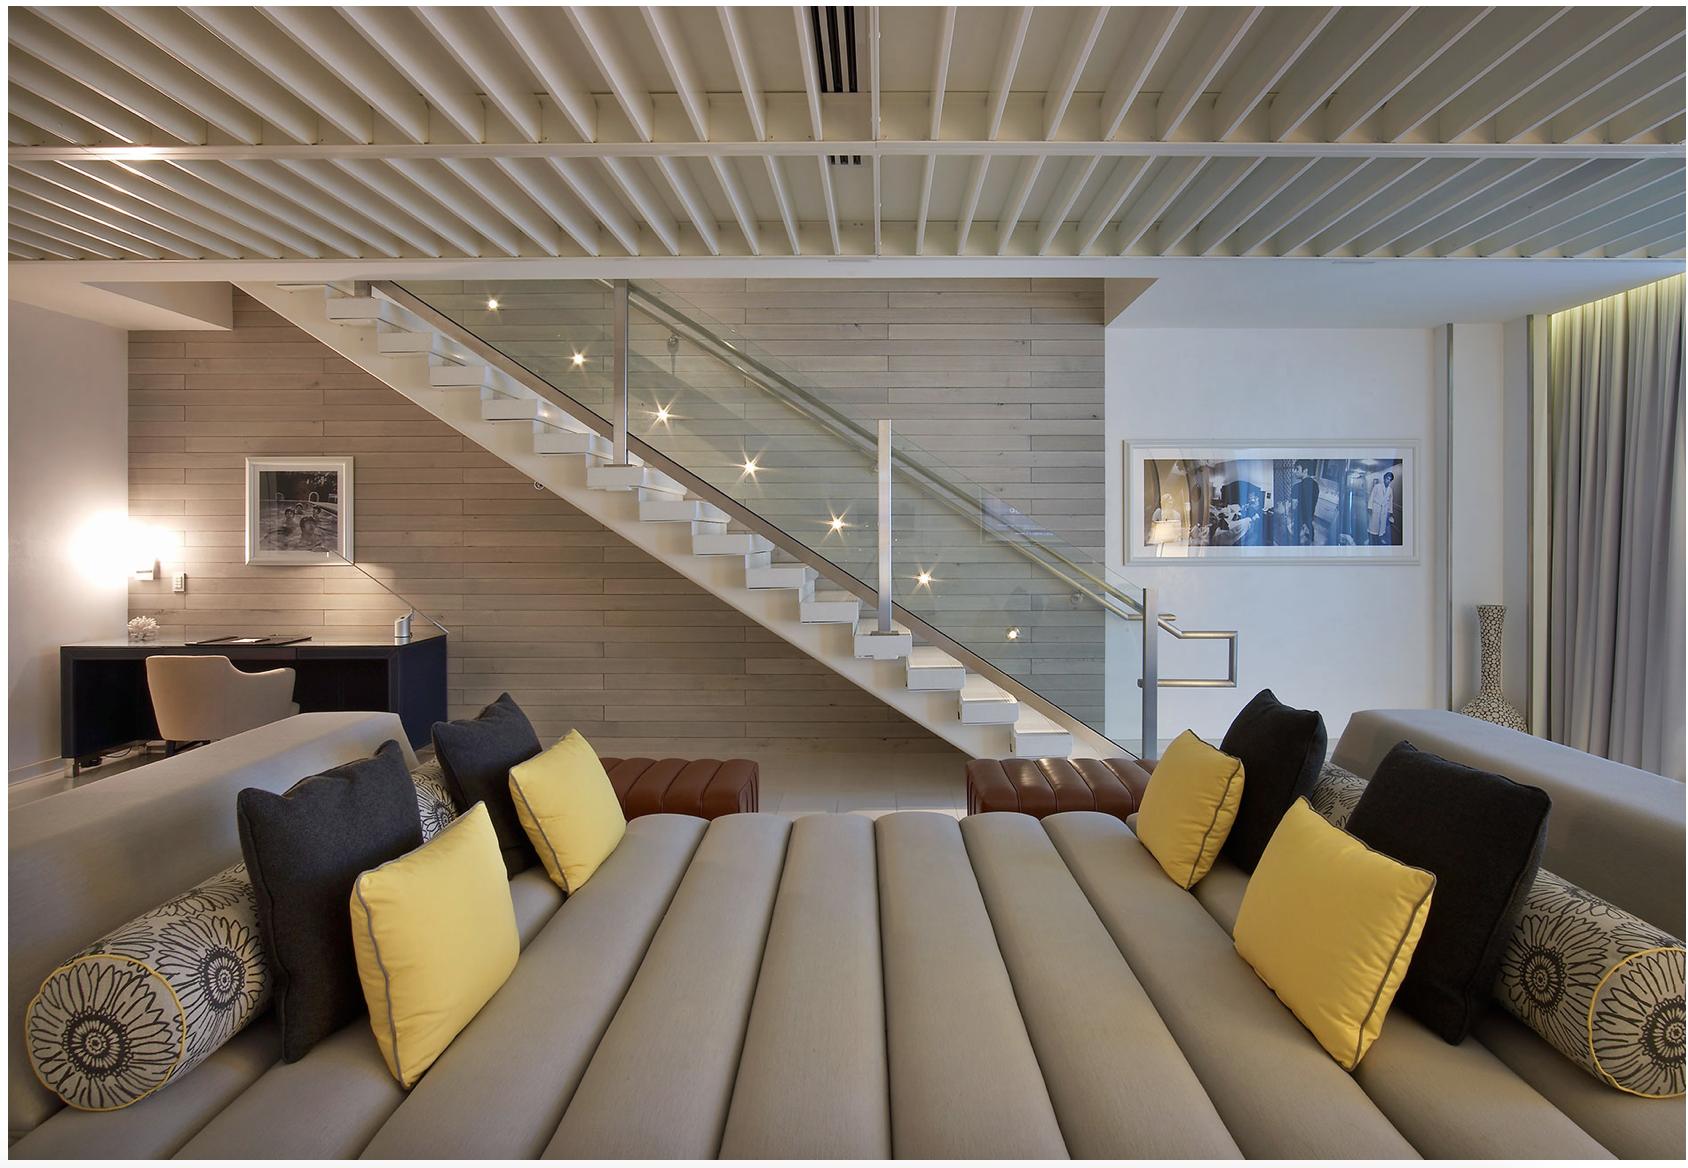 LyonsPlain contemporary interior .png